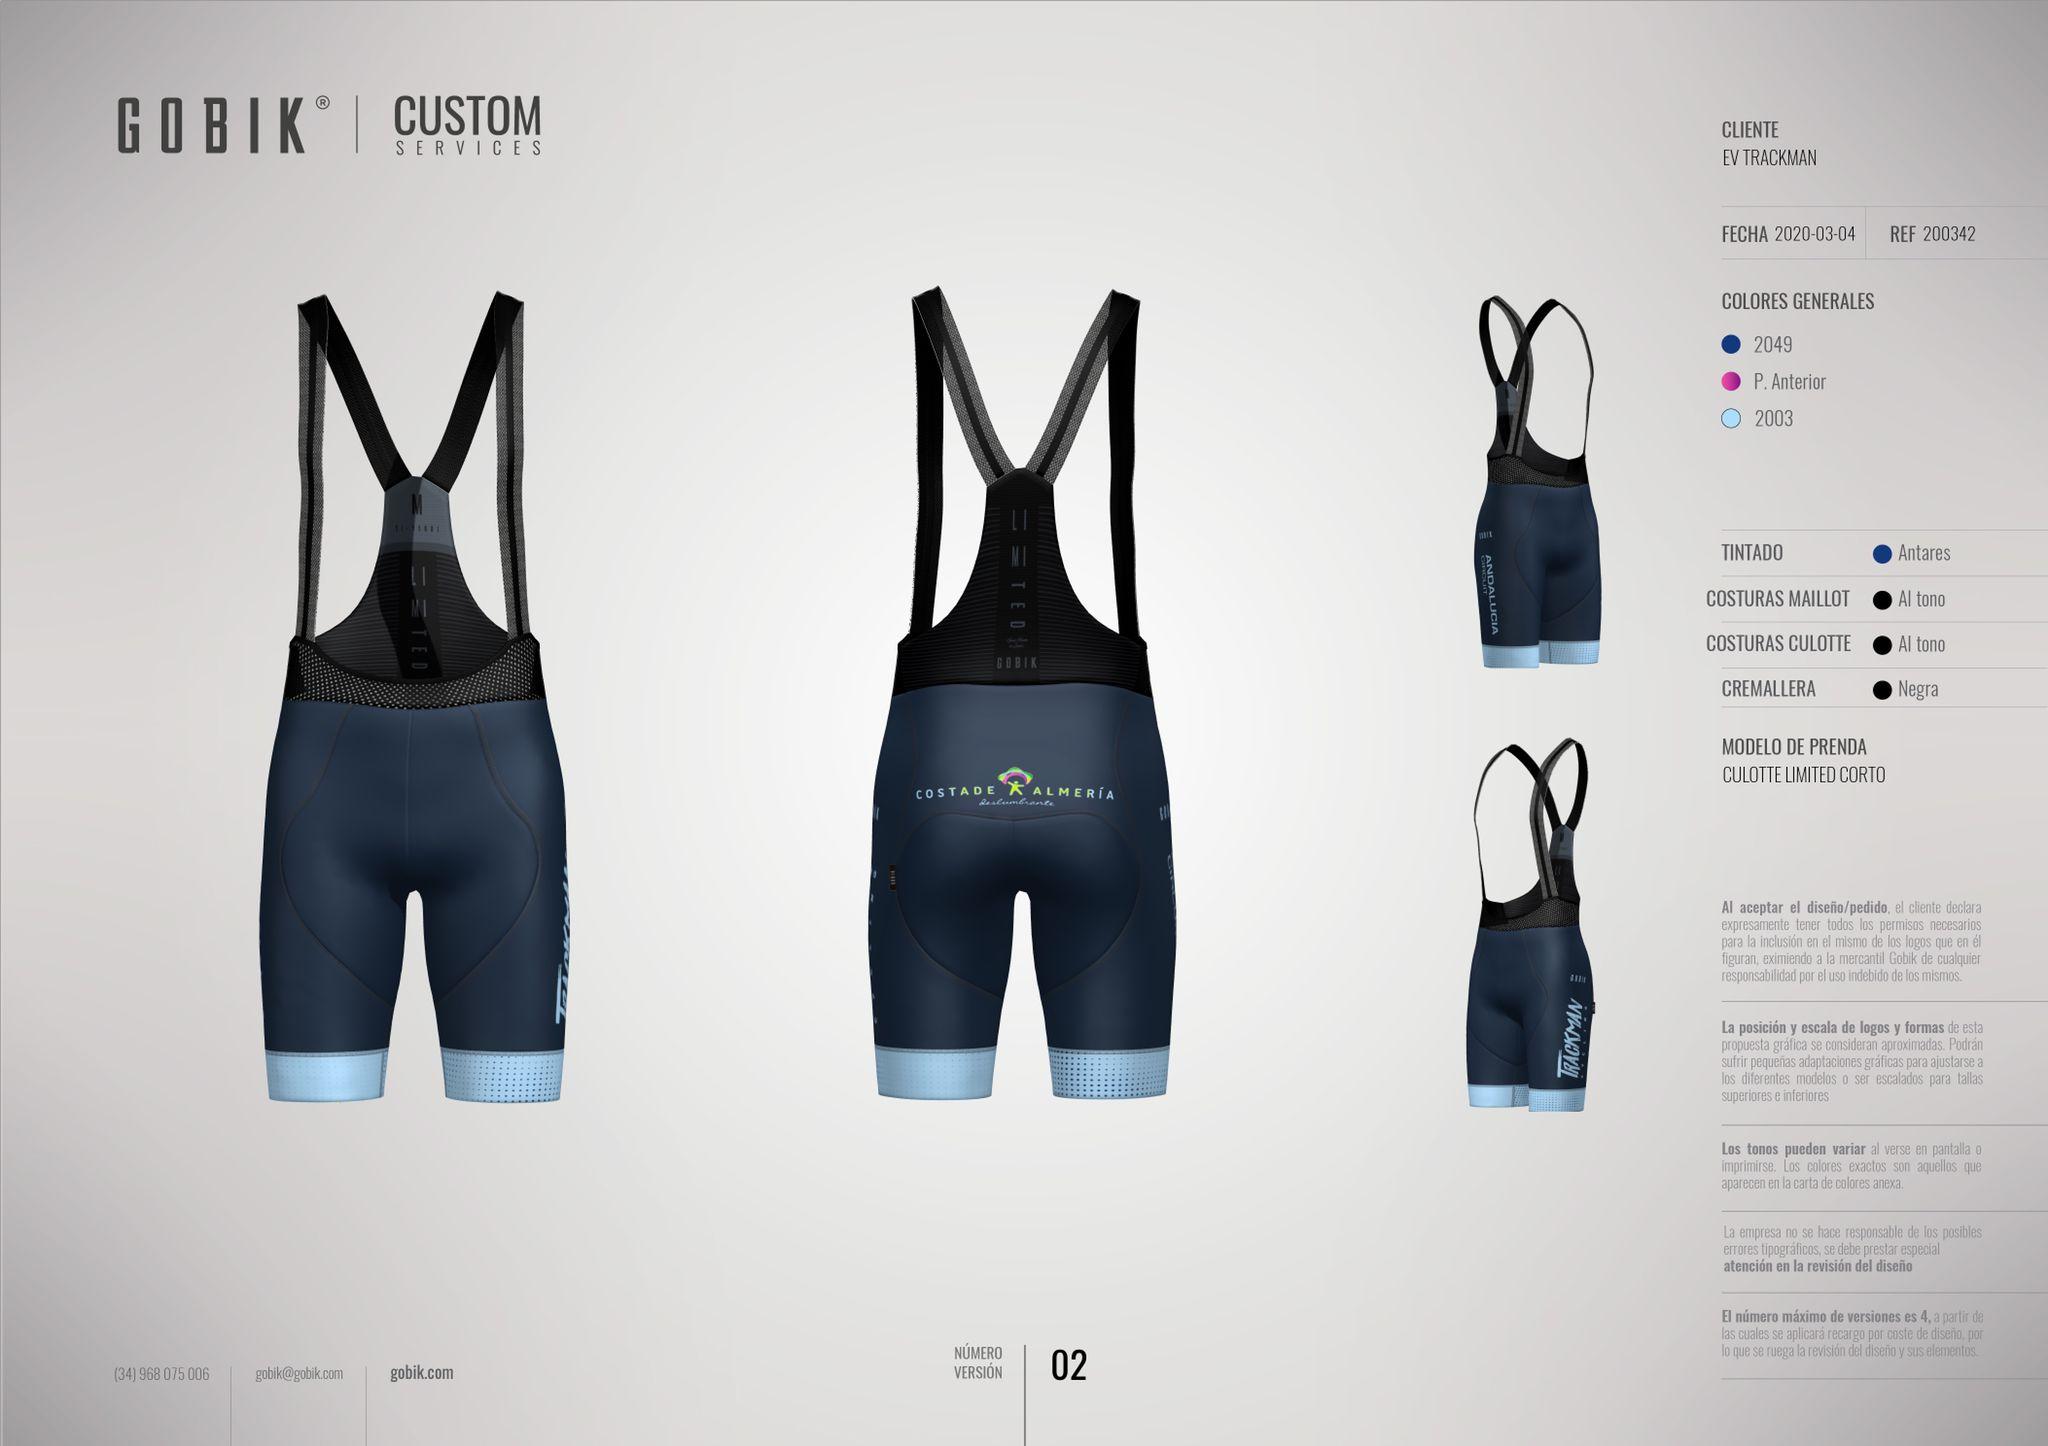 http://cronomur.es/assets/CULOTTE.jpg